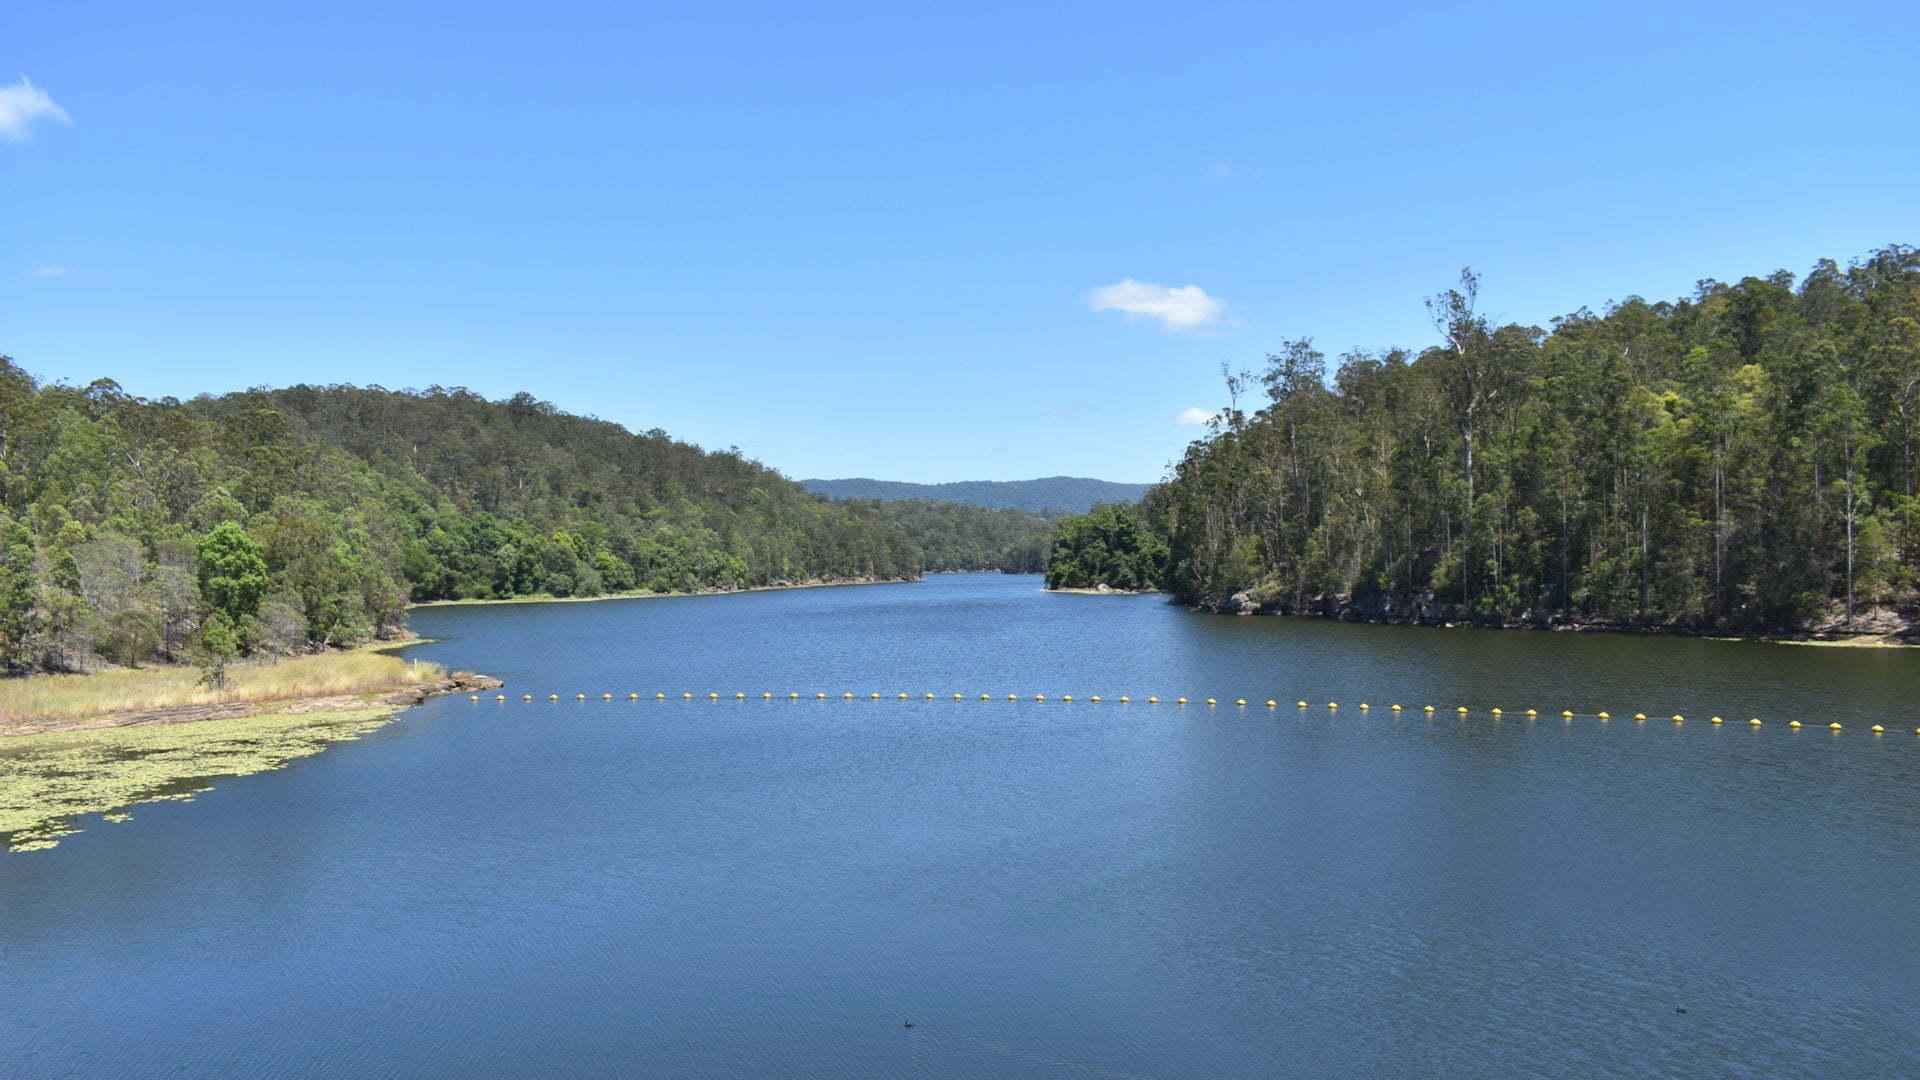 View of Toonumbar Dam water, taken from the Toonumbar Dam Wall